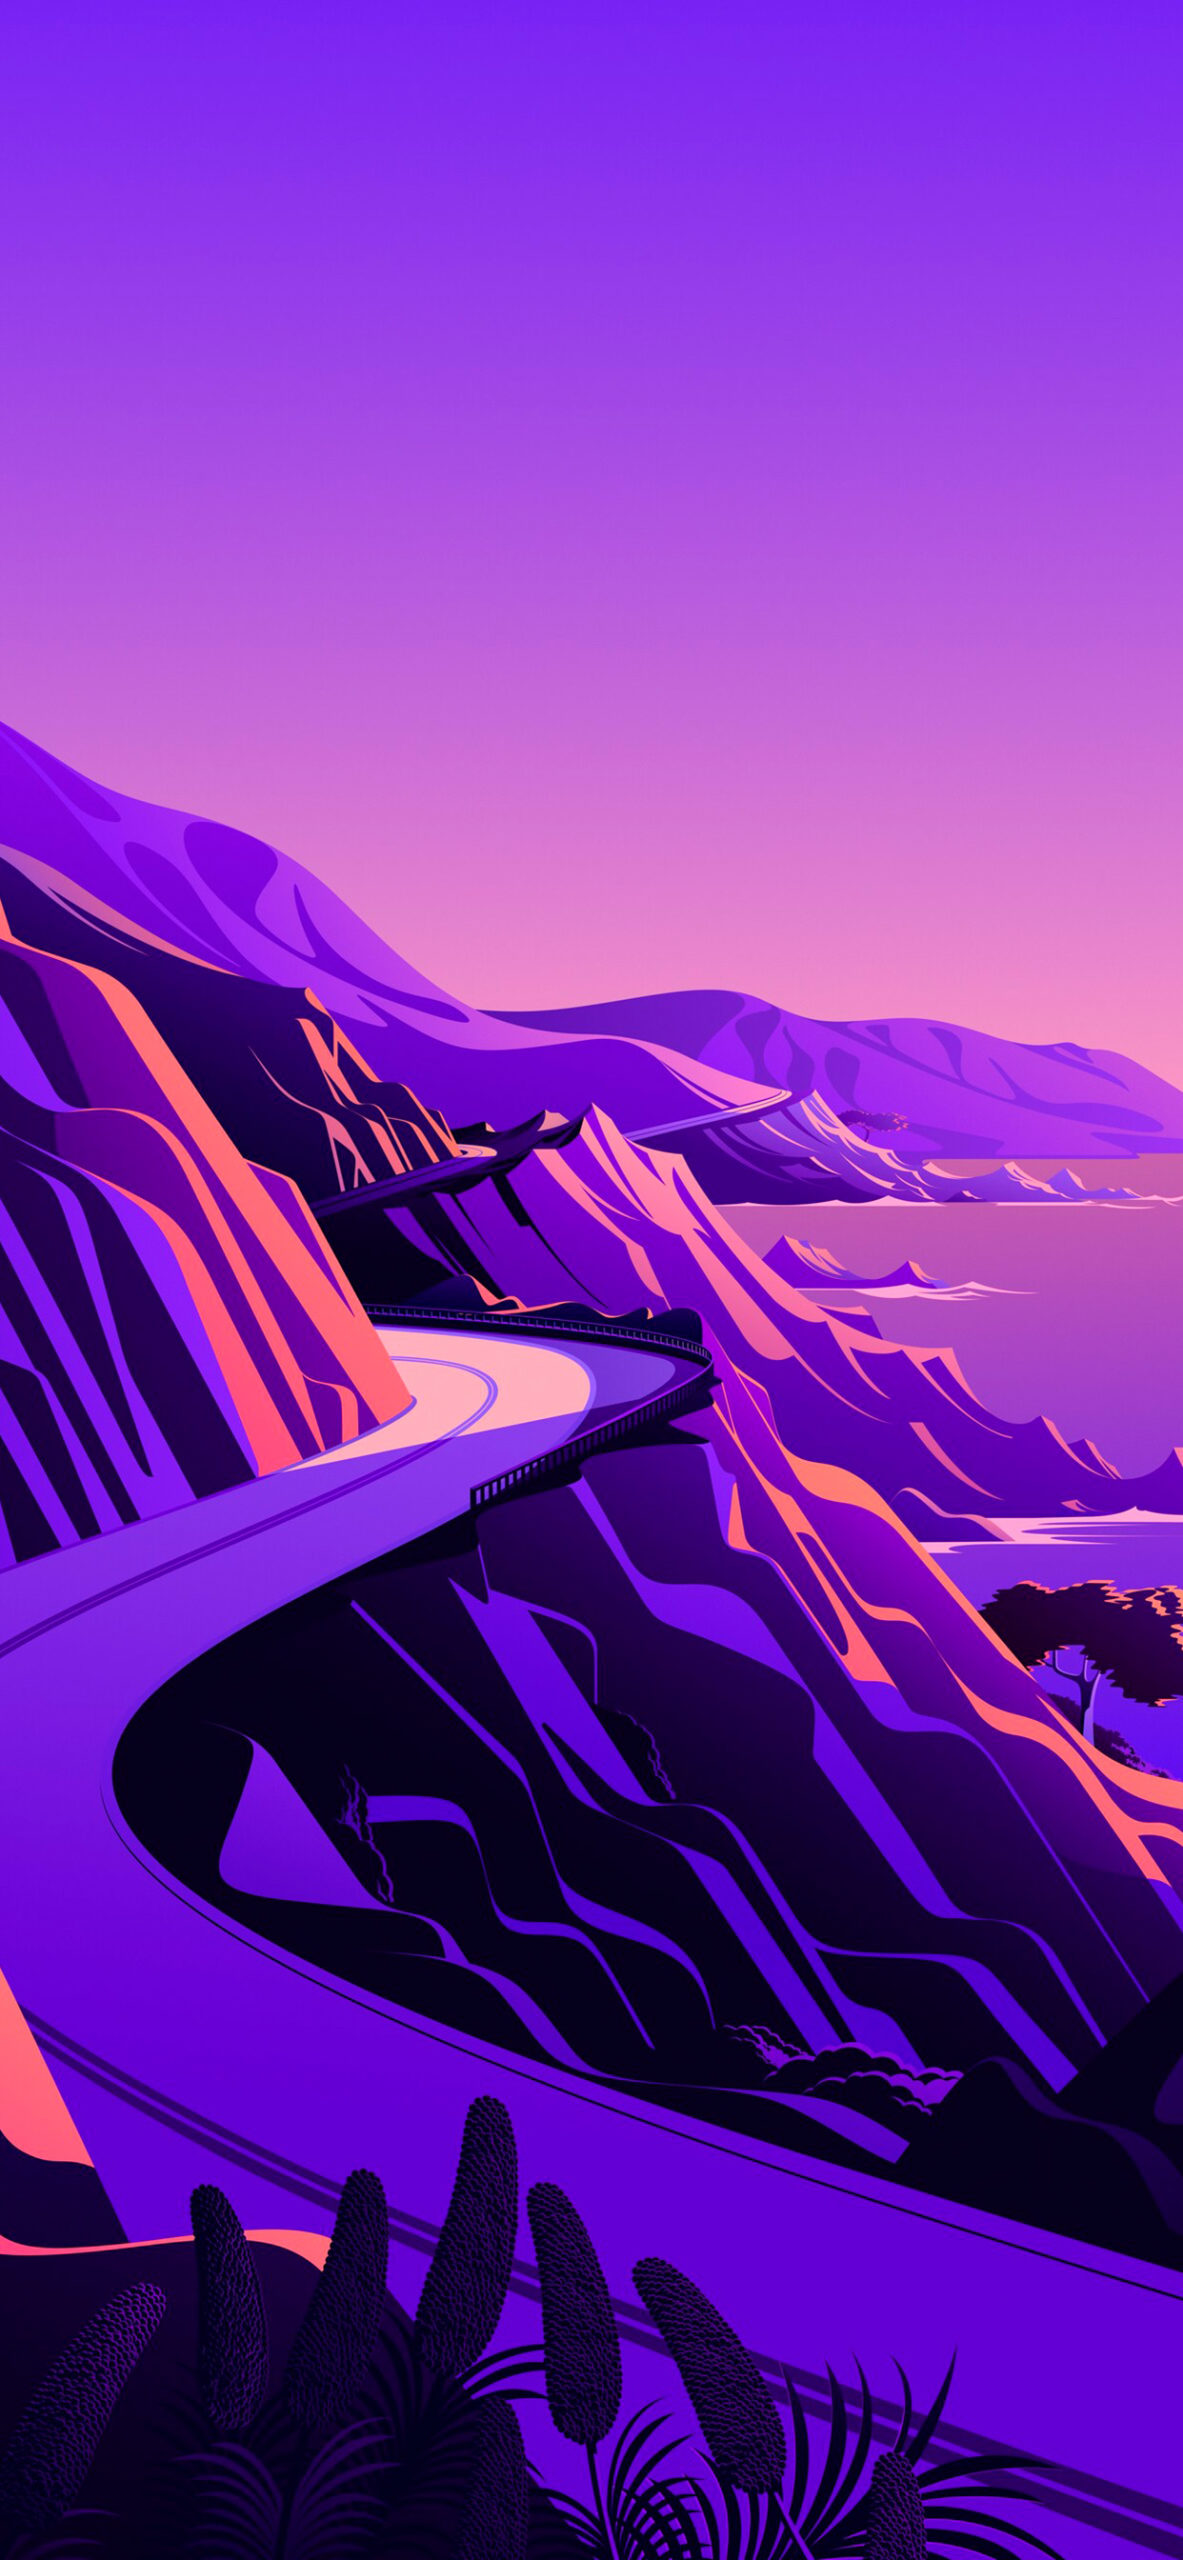 iphone wallpaper big sur cliffs5 scaled Mac OS Big Sur (Cliffs)